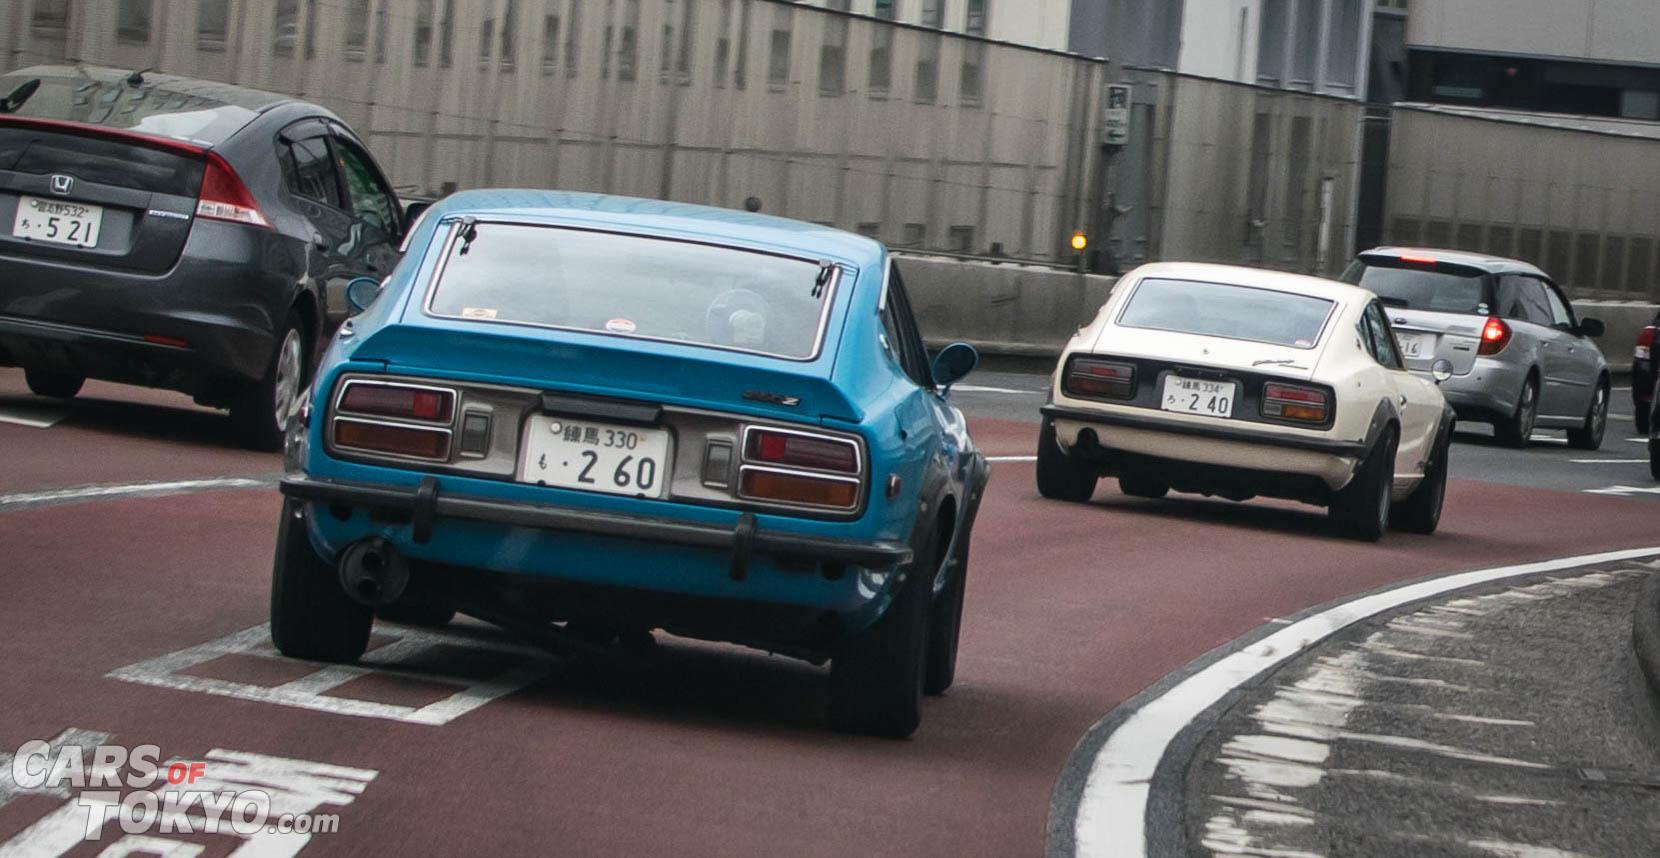 Cars of Tokyo Datsun Fairlady Z